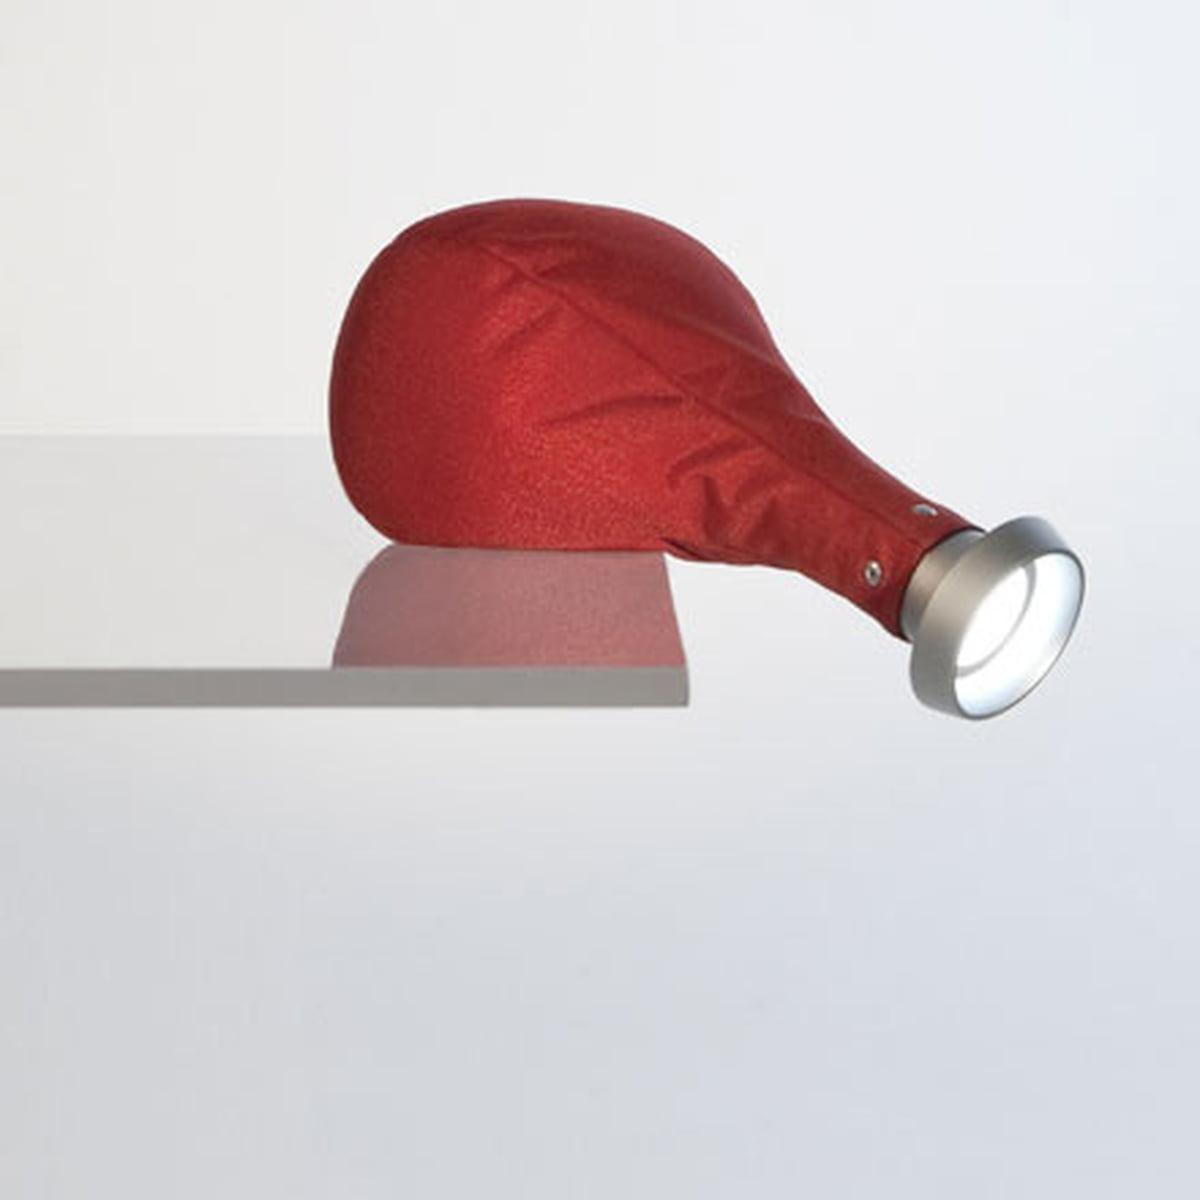 Lightsack led pema light lifestyle shop for Connox com